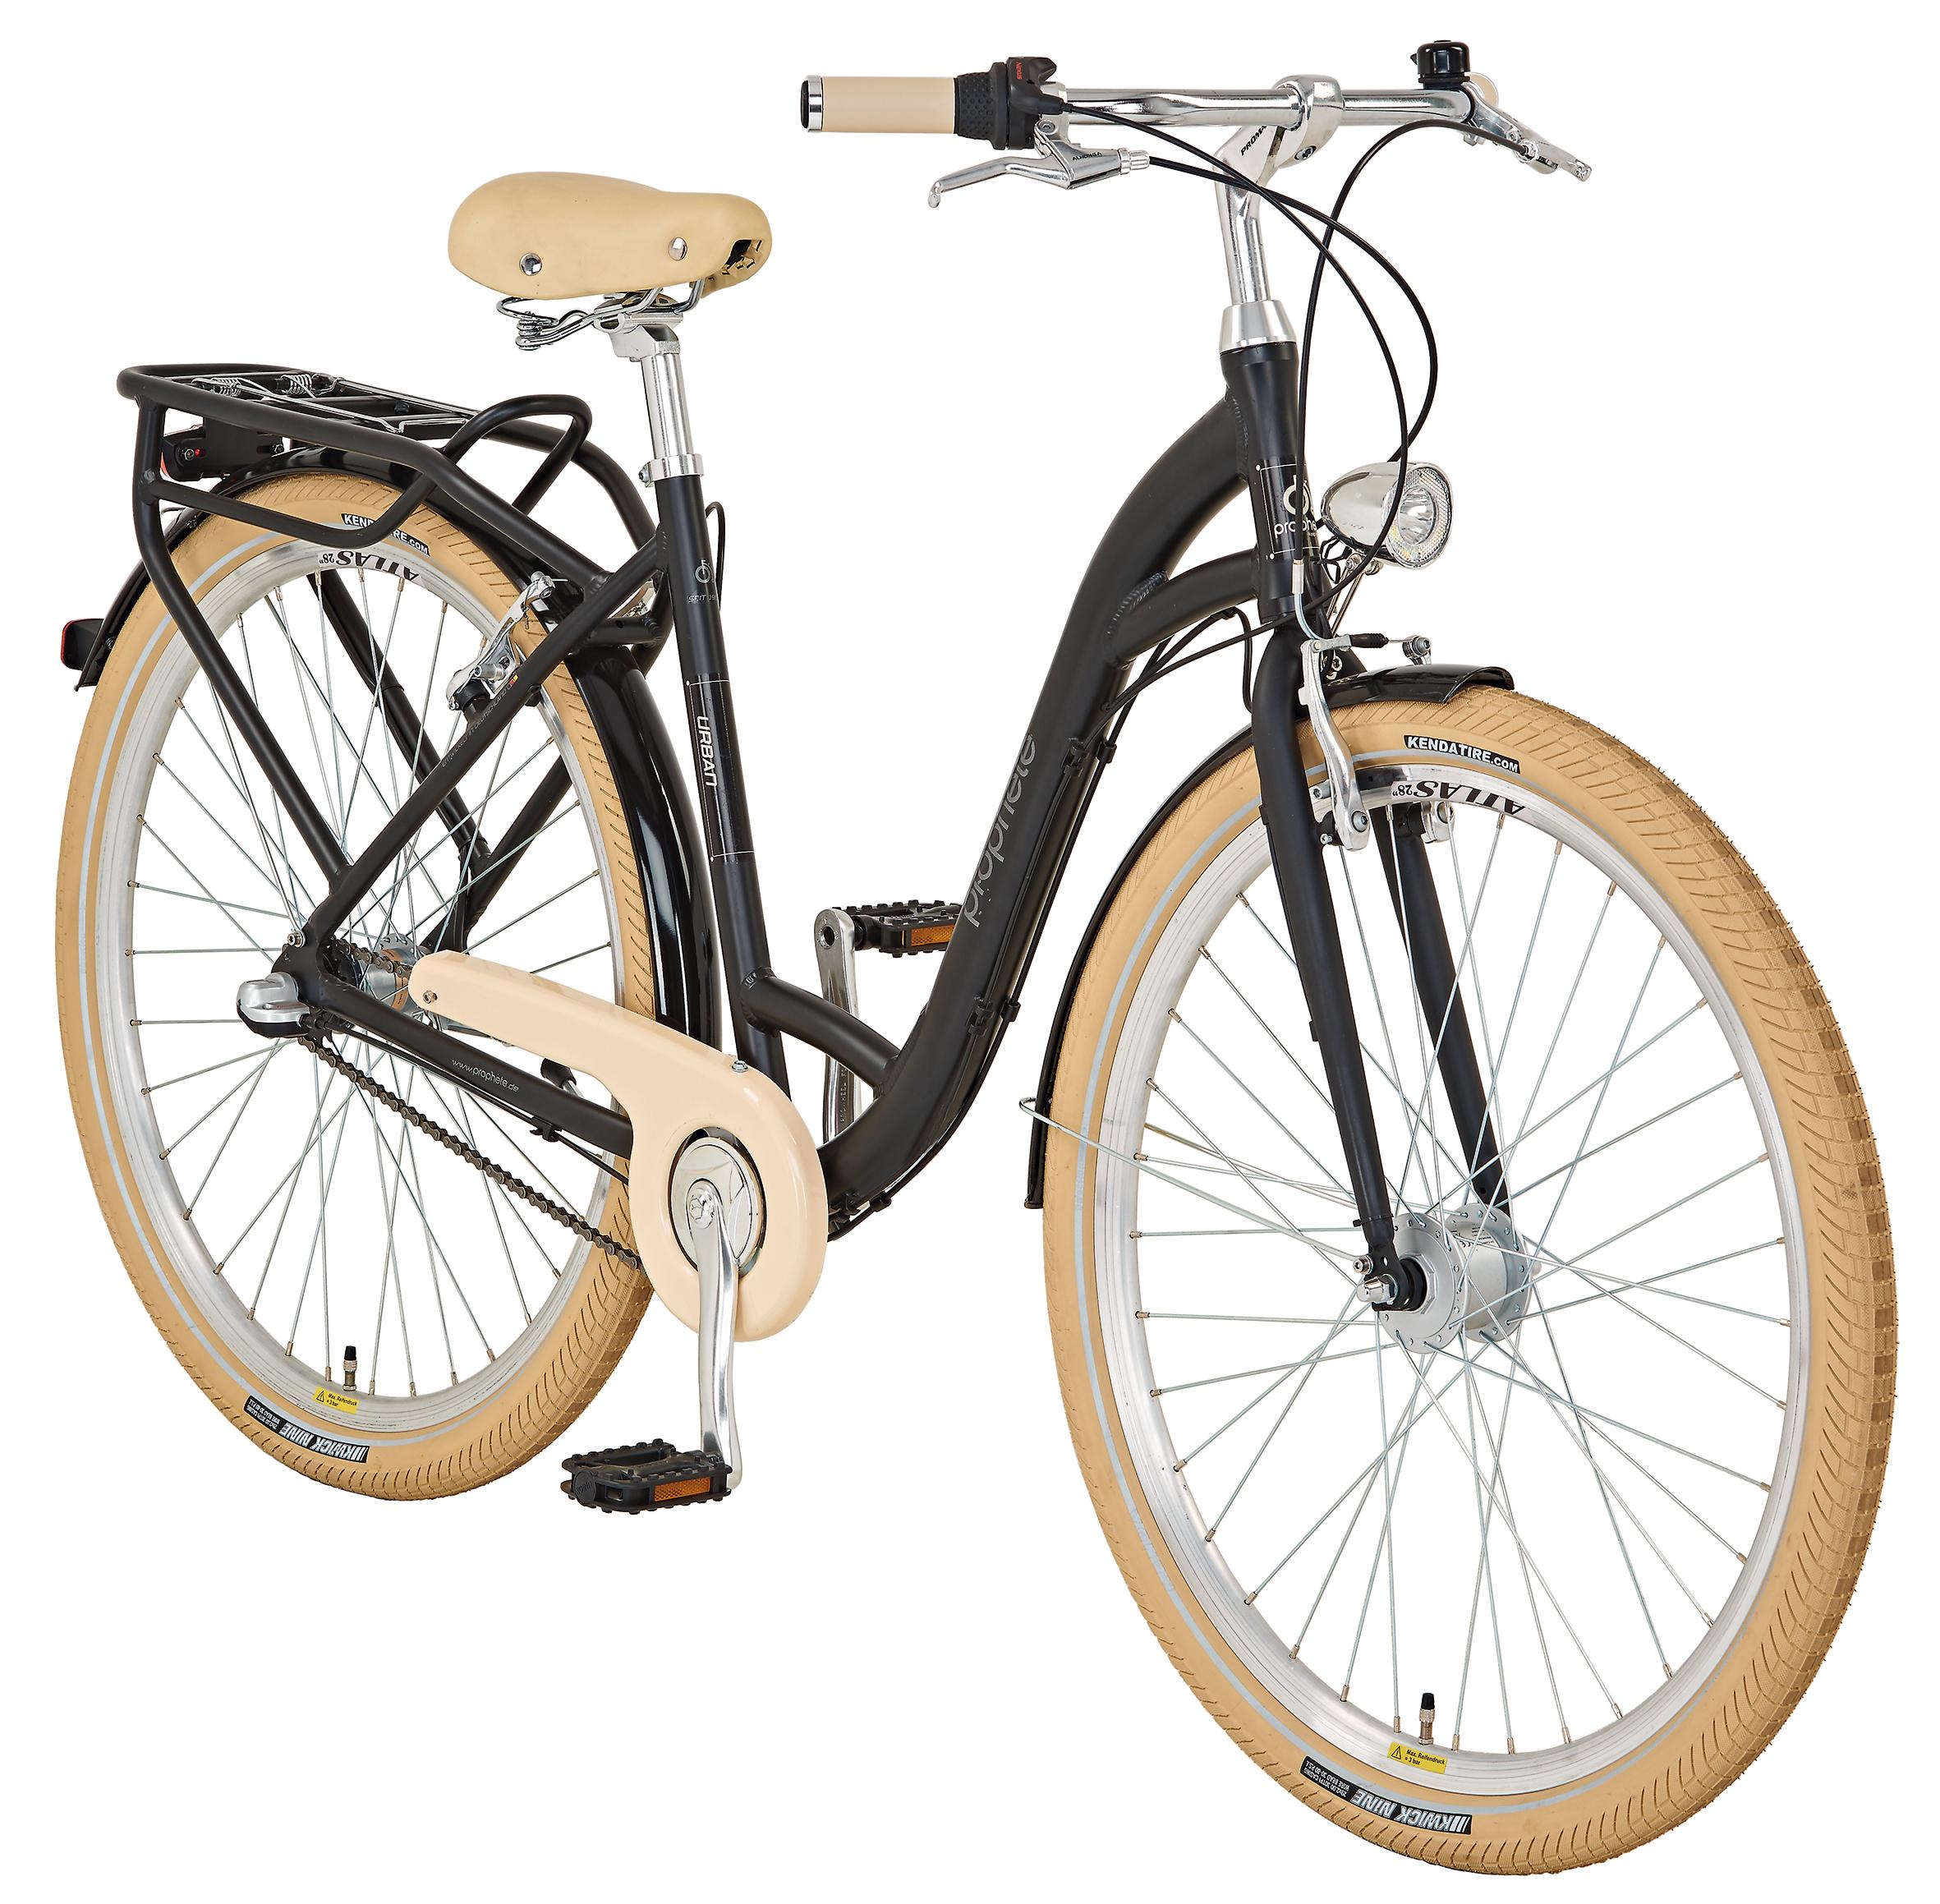 "Prophete Fahrrad / Cityrad Geniesser 9.2 City Bike 28"" Damen Bild 2"